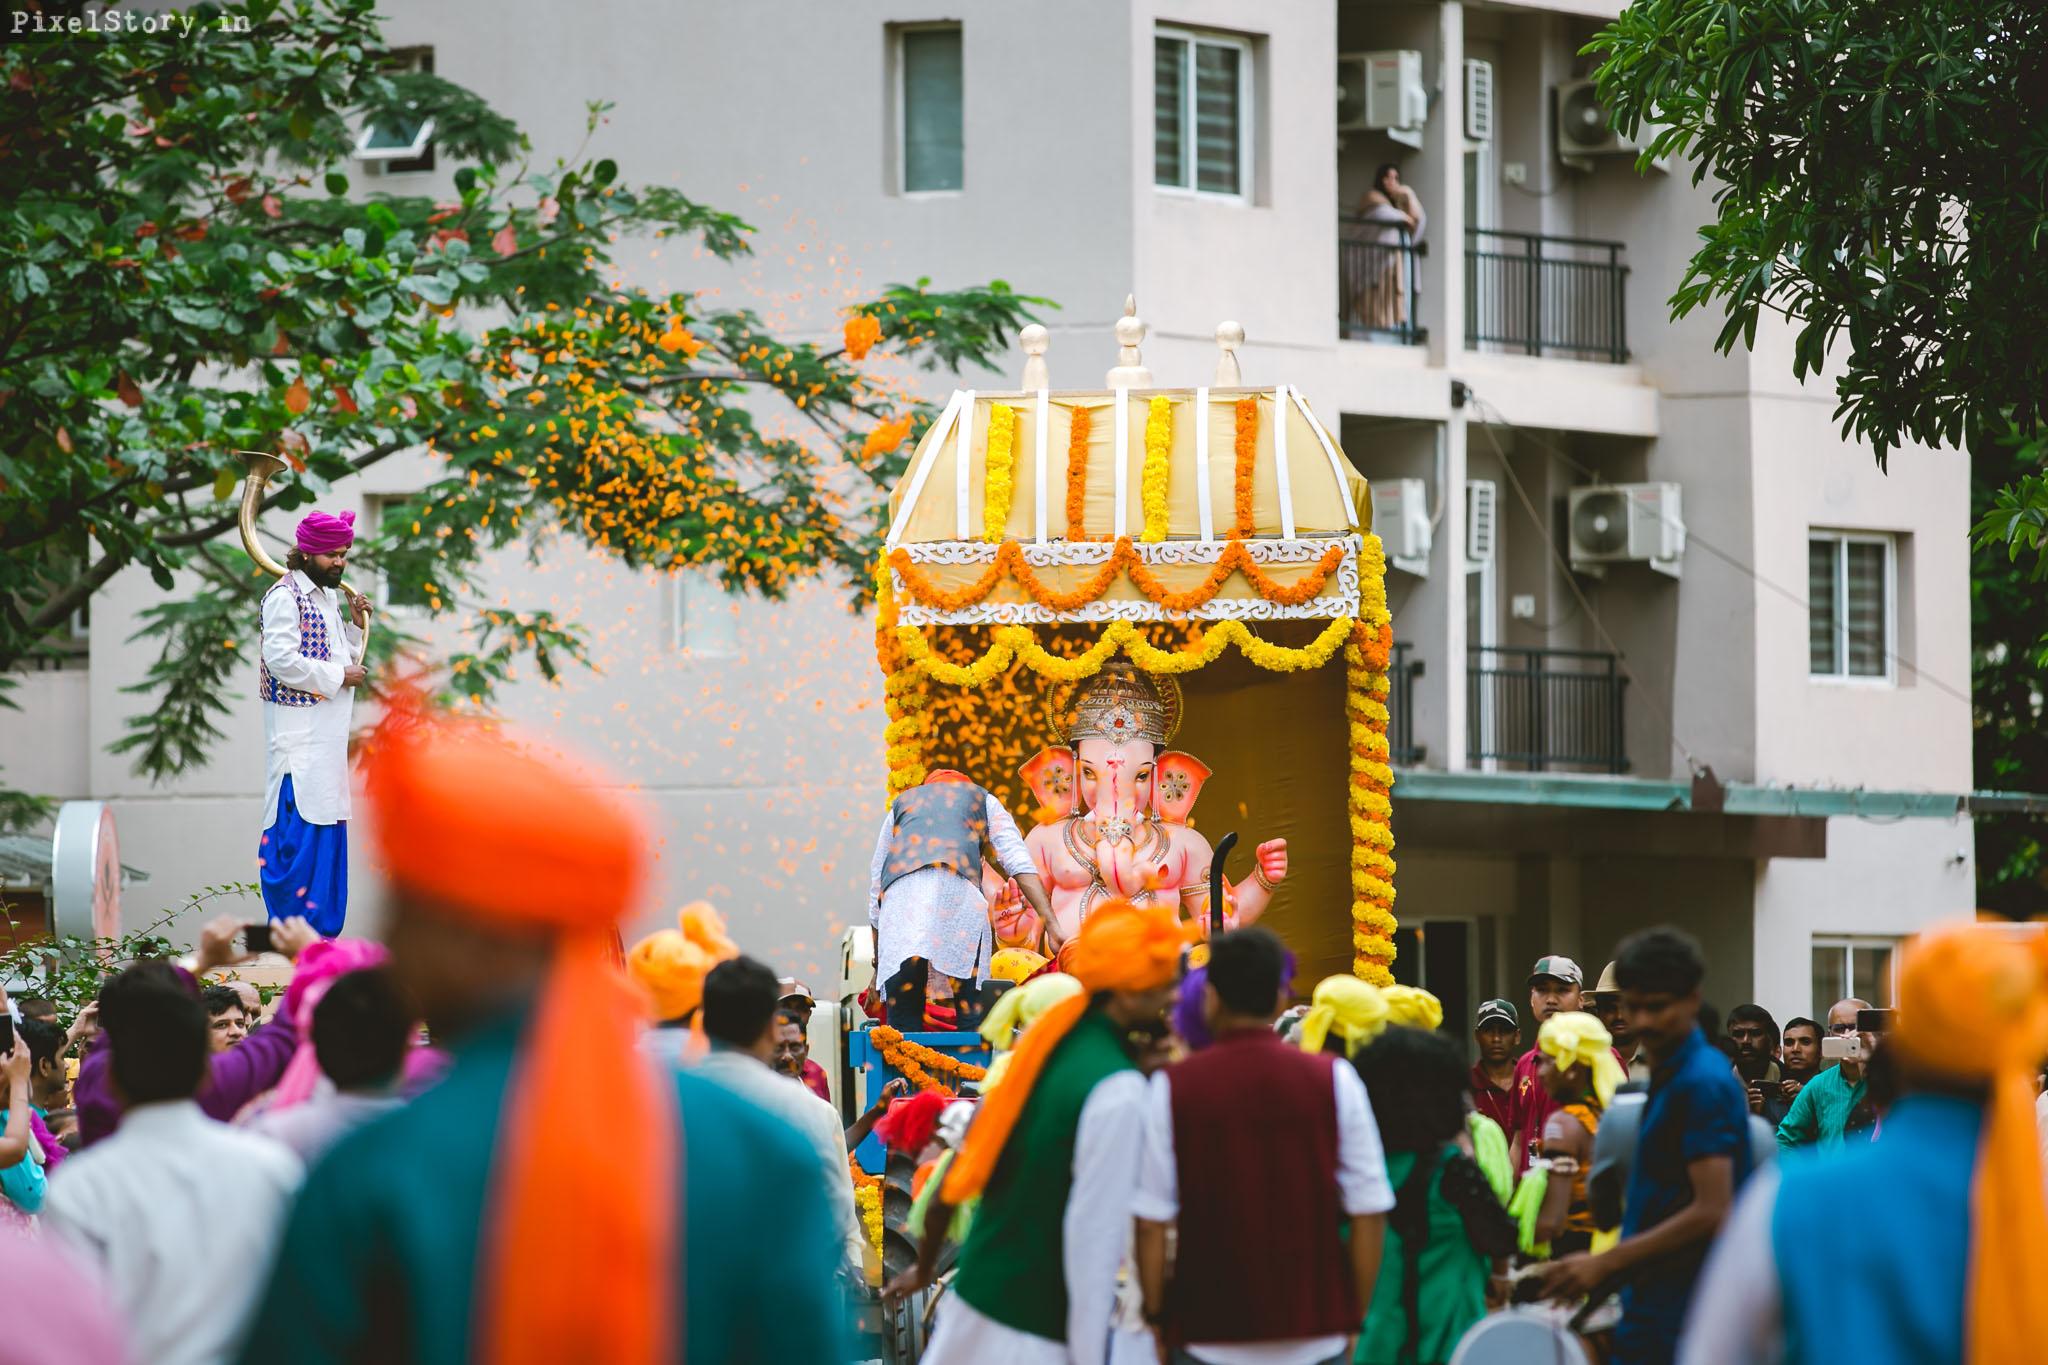 PixelStory-Ganesh-Utsav-2017-028.jpg